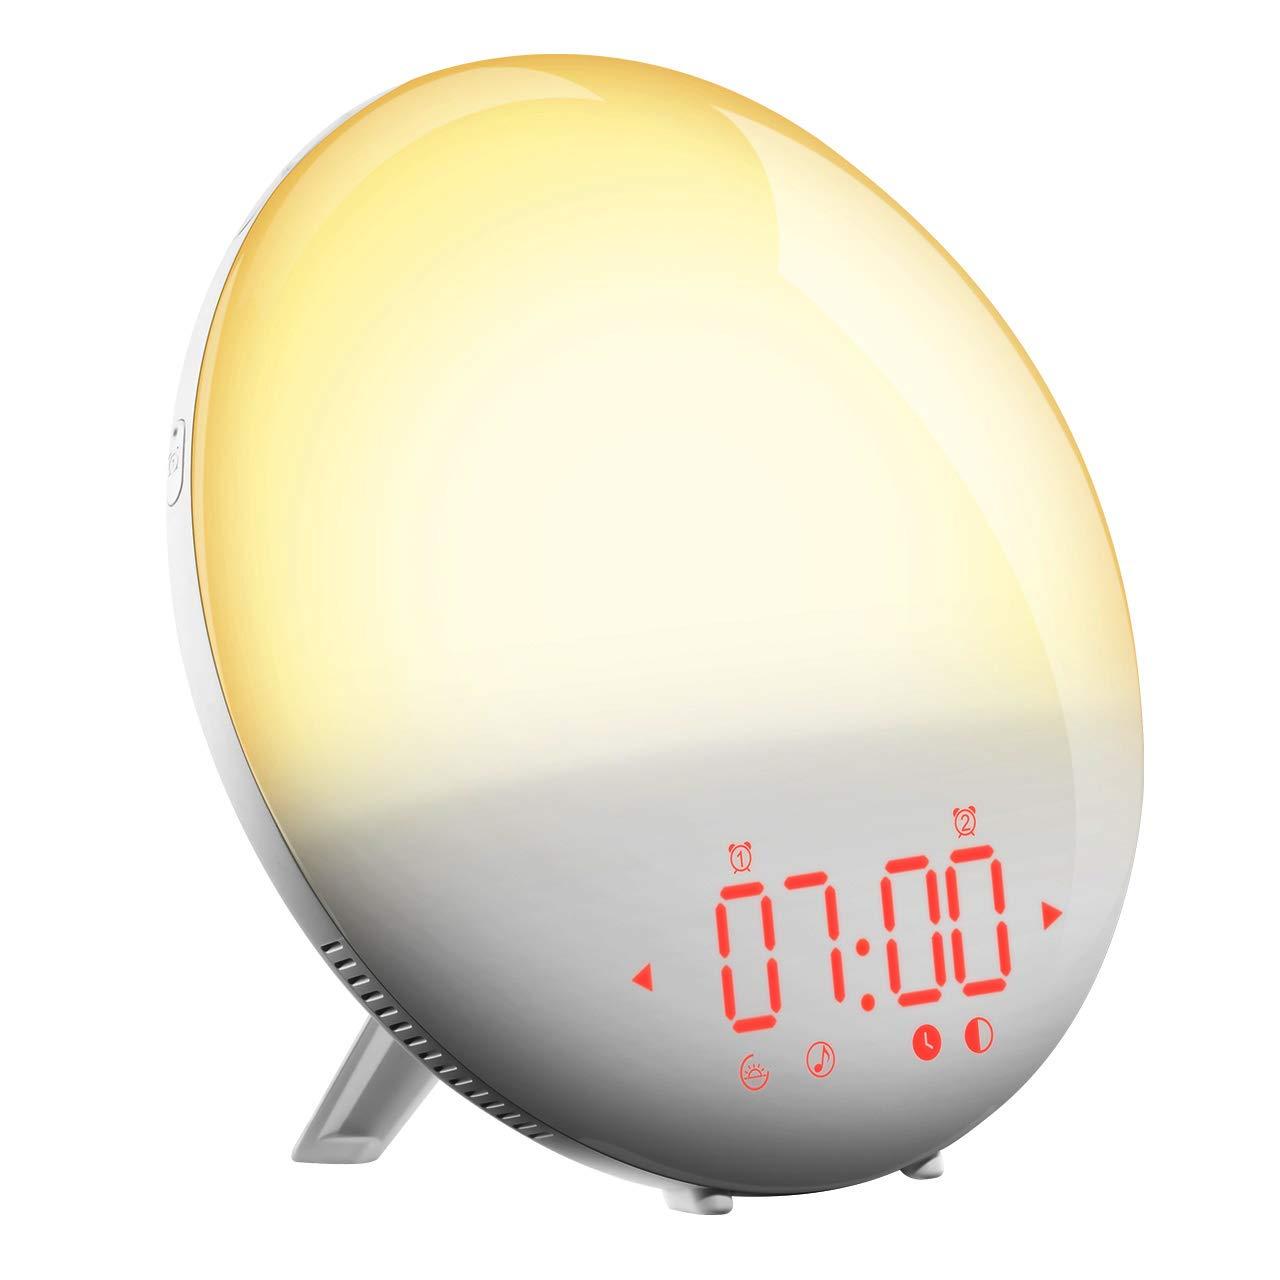 Wake-Up Alarm Clock, PICTEK Sunrise Simulation Wake-Up Light Clock with Night Light, FM Radio, Digital Alarm Clock with Dual Alarm Time/6 Alarm Sounds/20 Brightness Levels for Kids Adults Heavy Sleepers